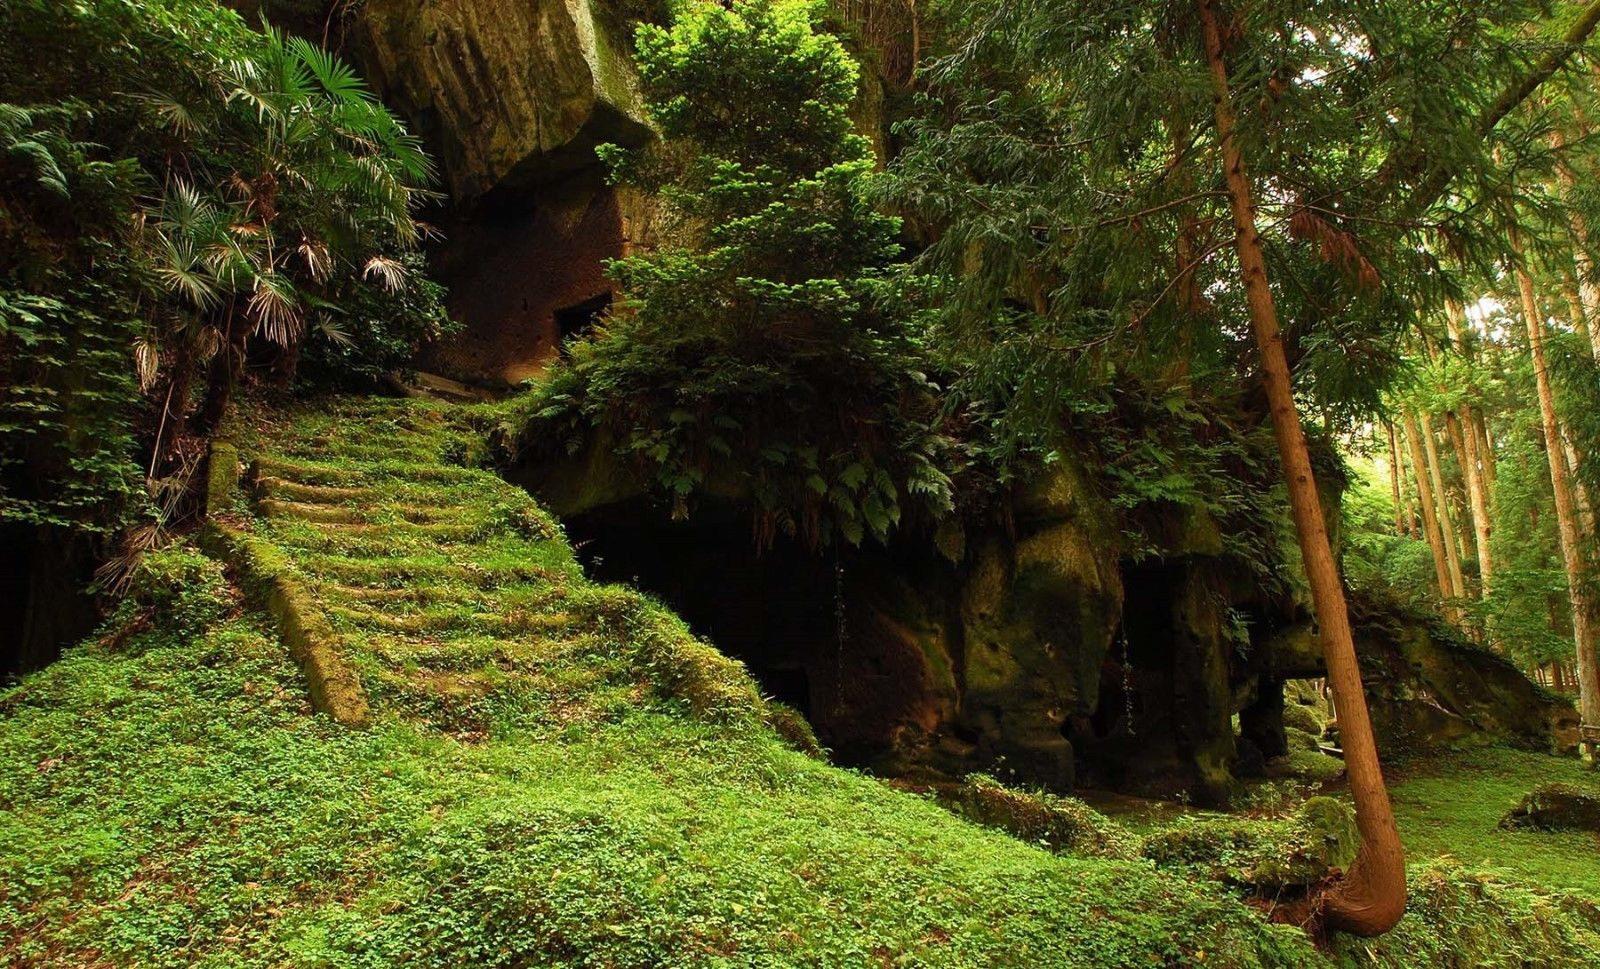 121362 verde Forest Rain Jungle Mountains Decor WALL PRINT POSTER AU